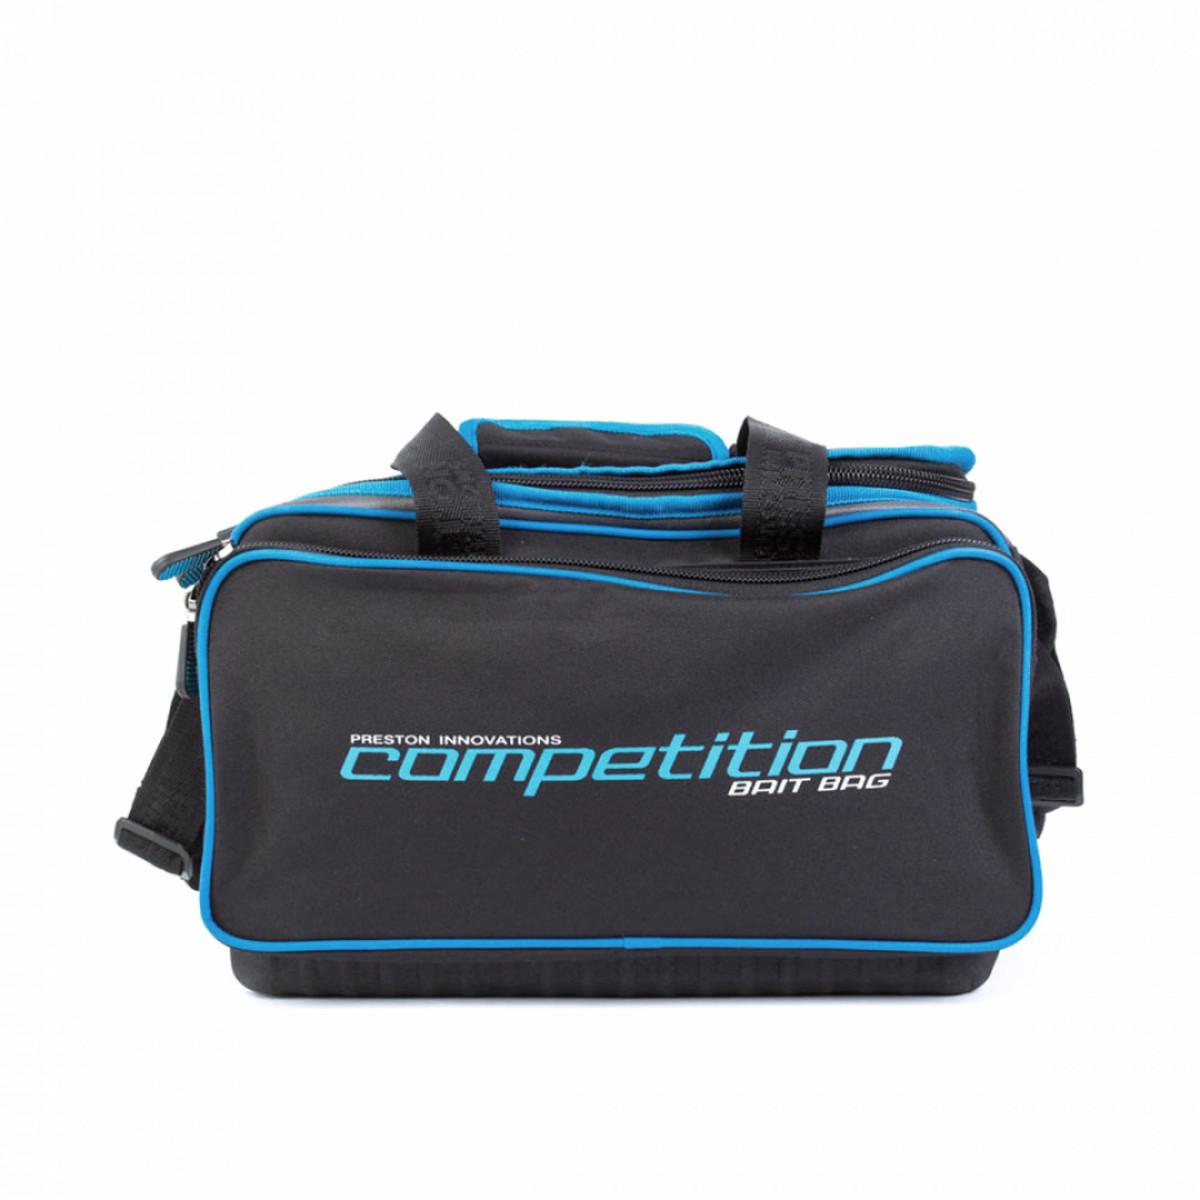 Competition Bait Bag